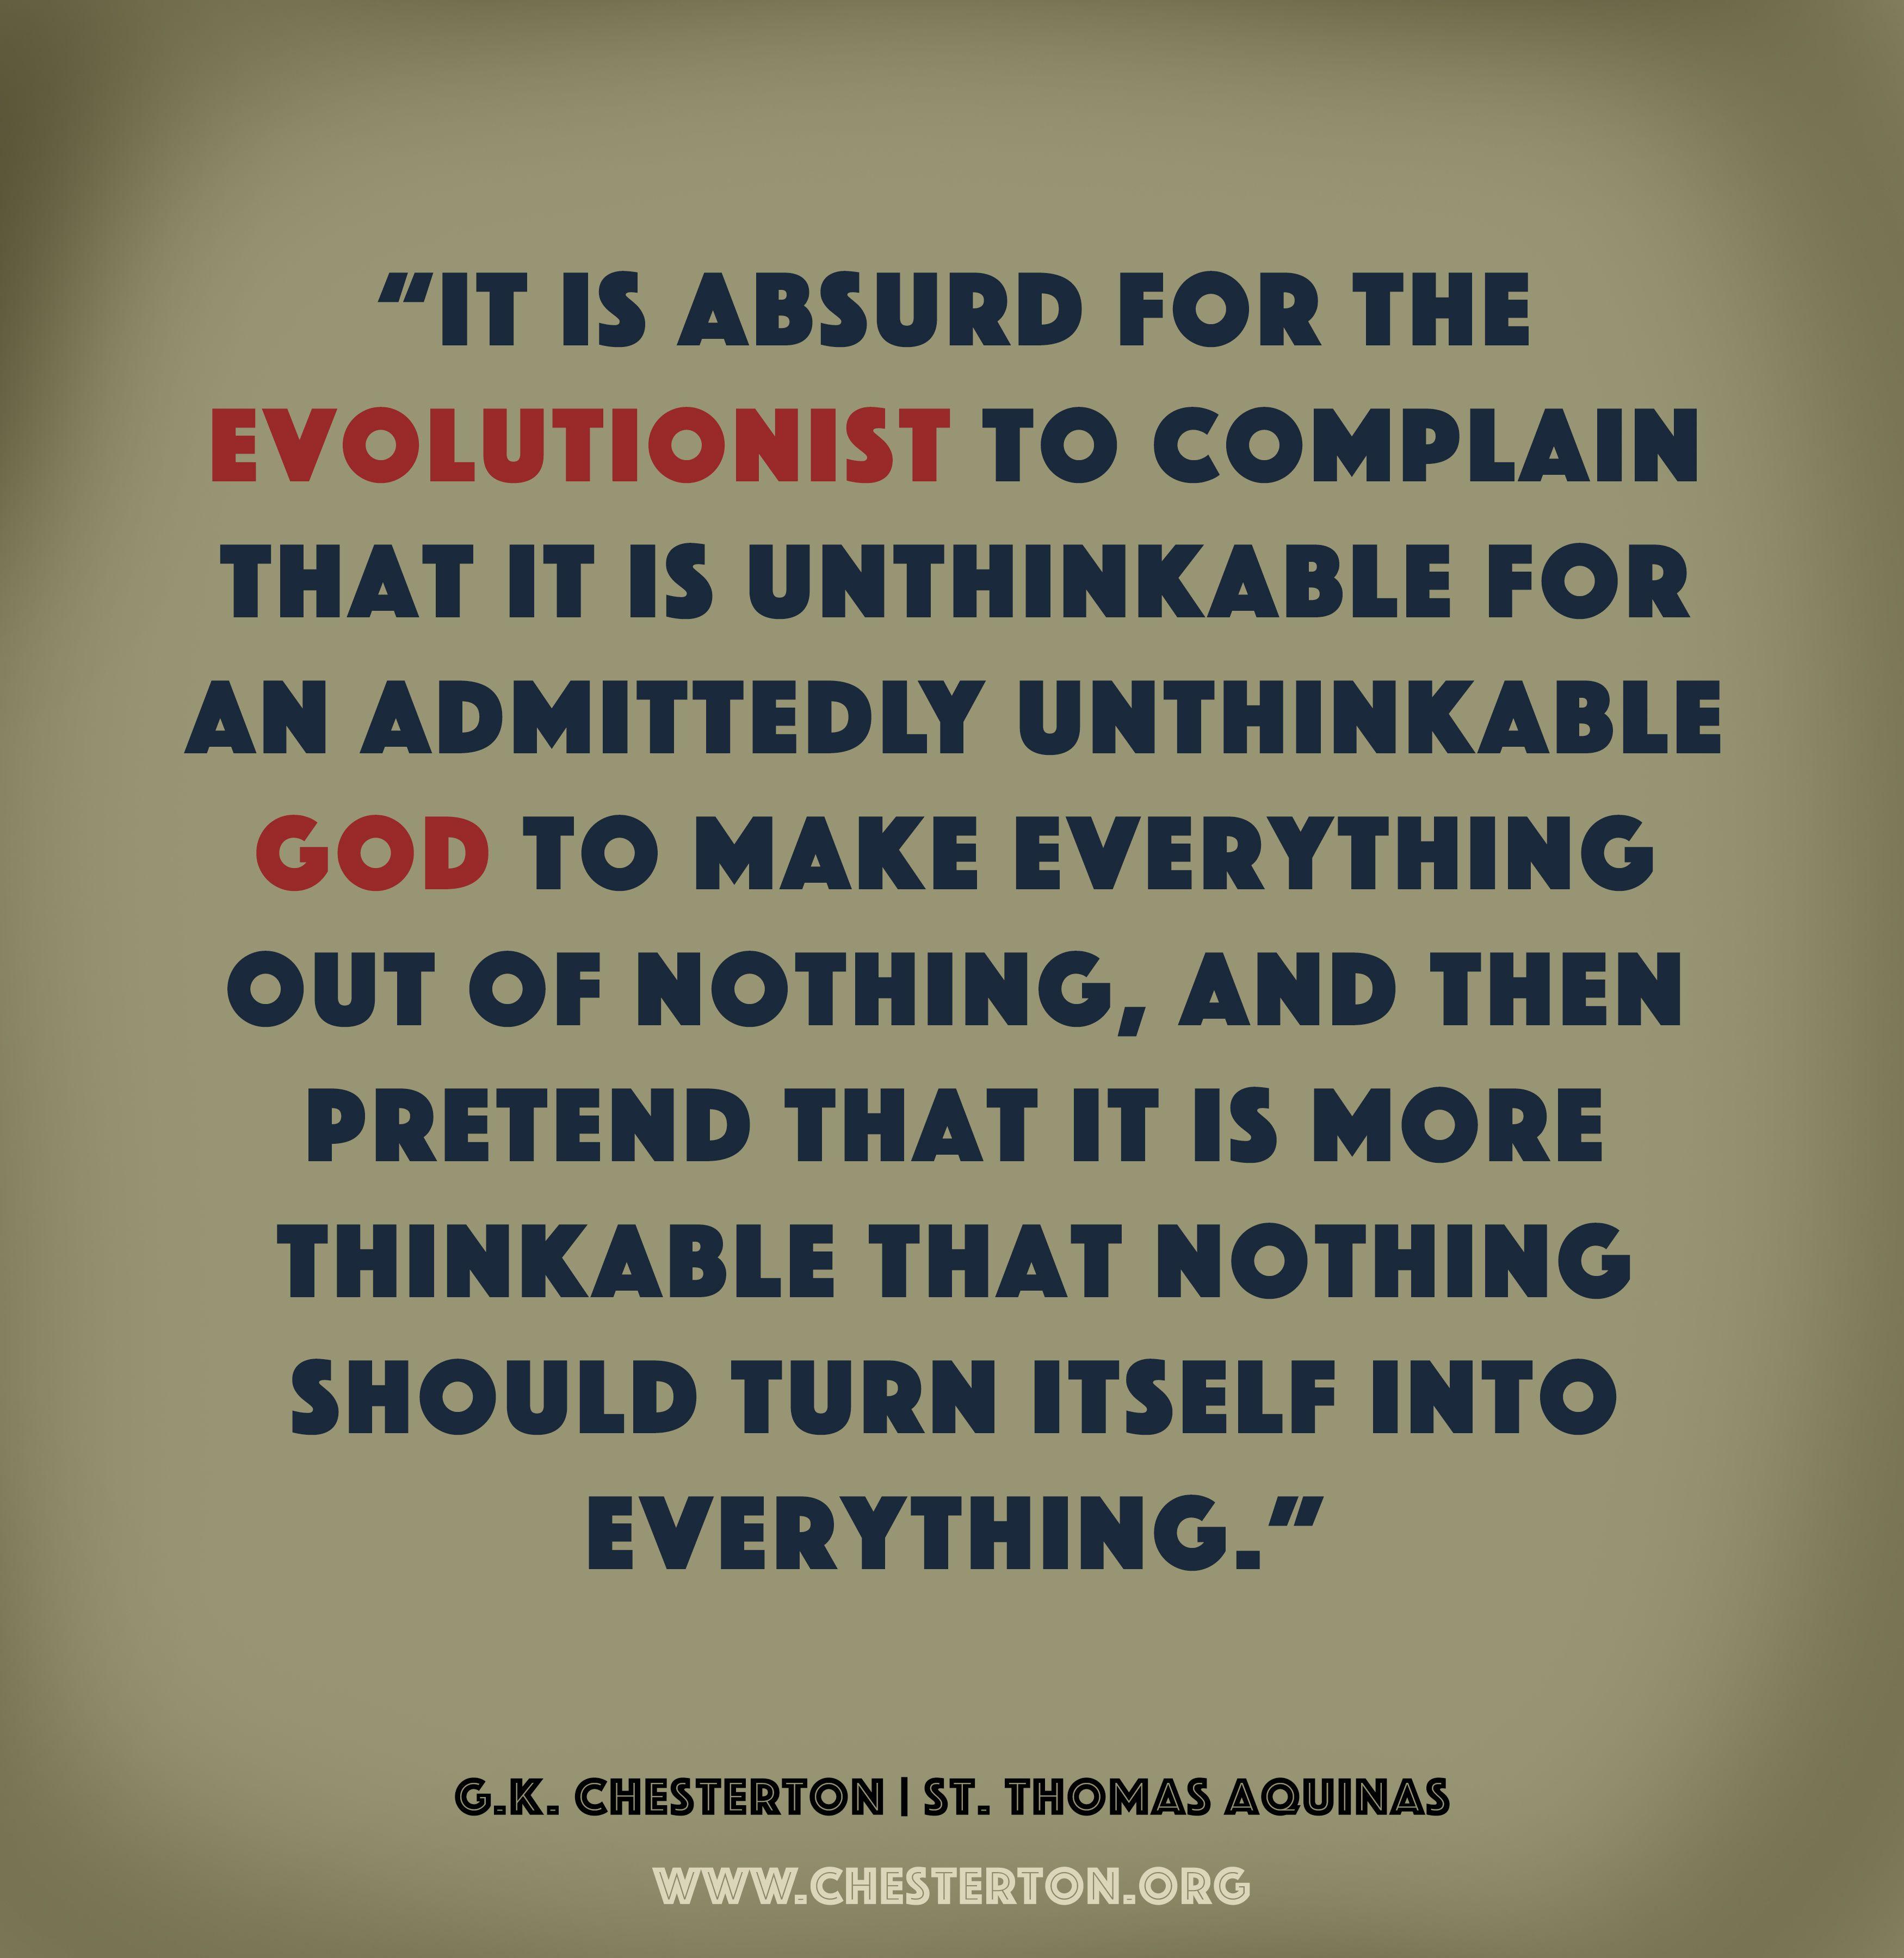 Chesterton\'s St. Thomas Aquinas! | Discernment | Pinterest